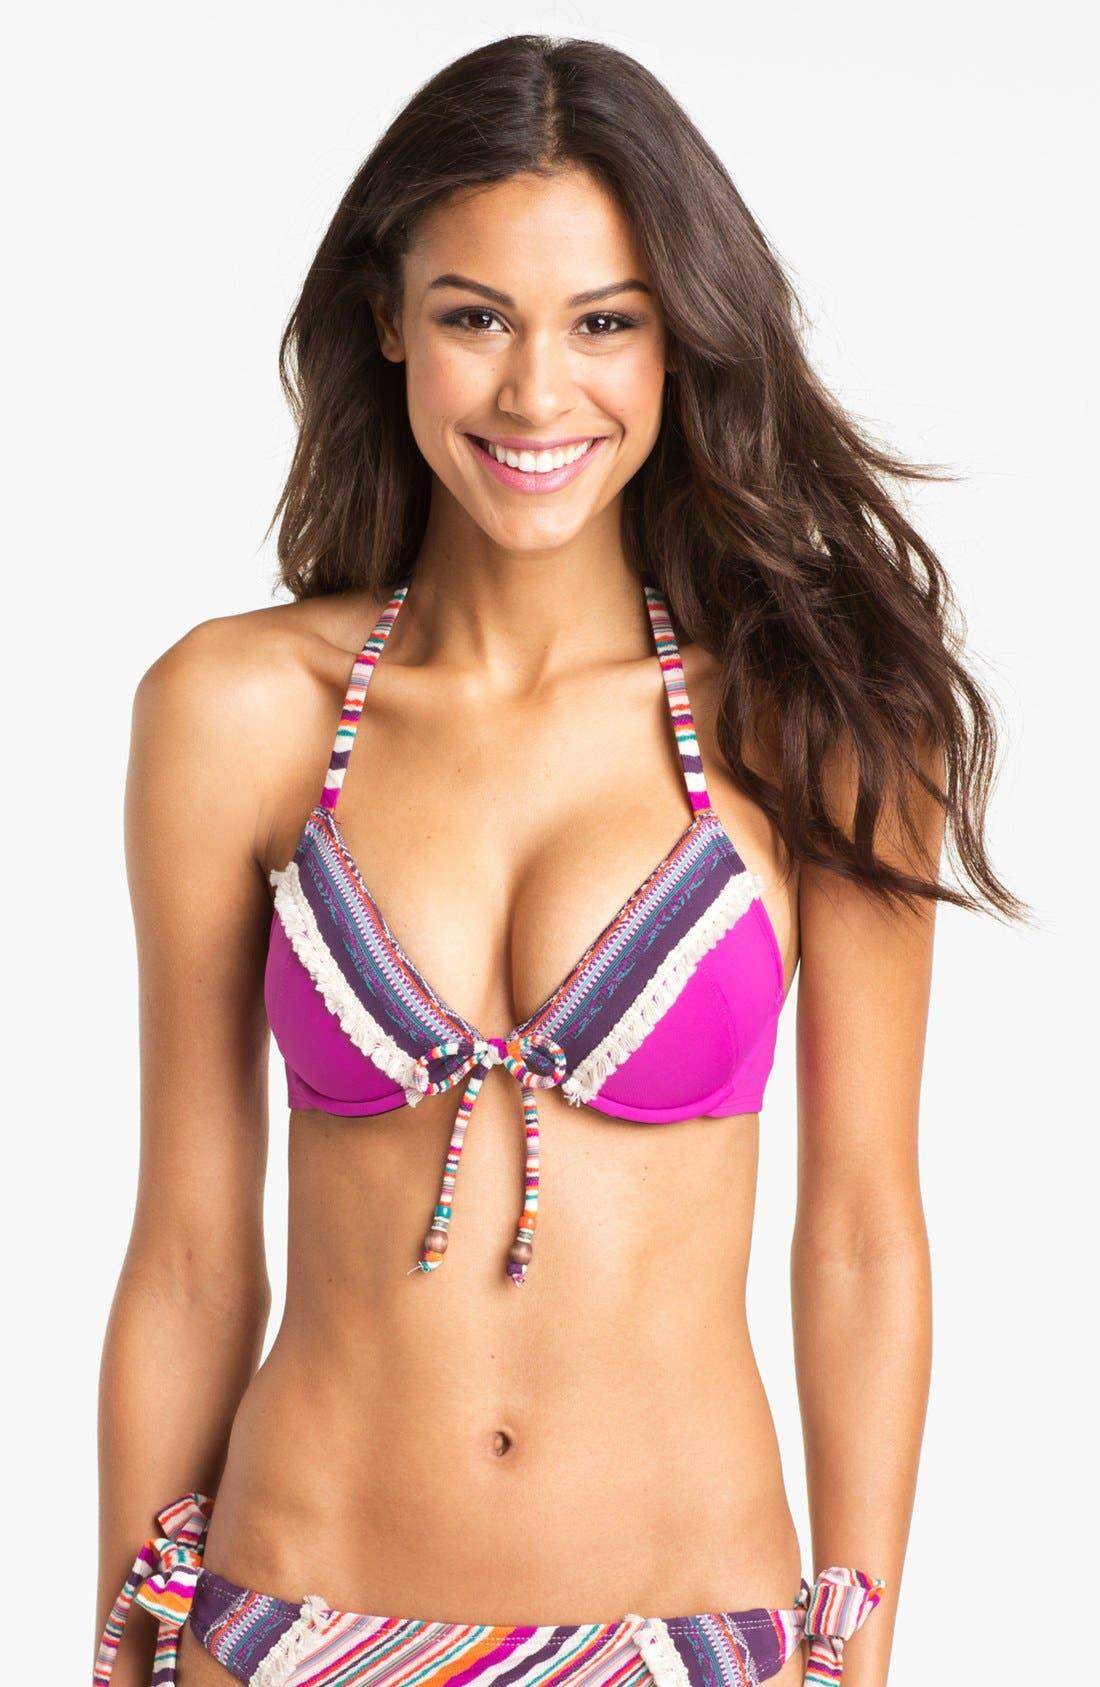 Alternate Image 1 Selected - Lucky Brand Swimwear 'Mumbai' Underwire Bikini Top